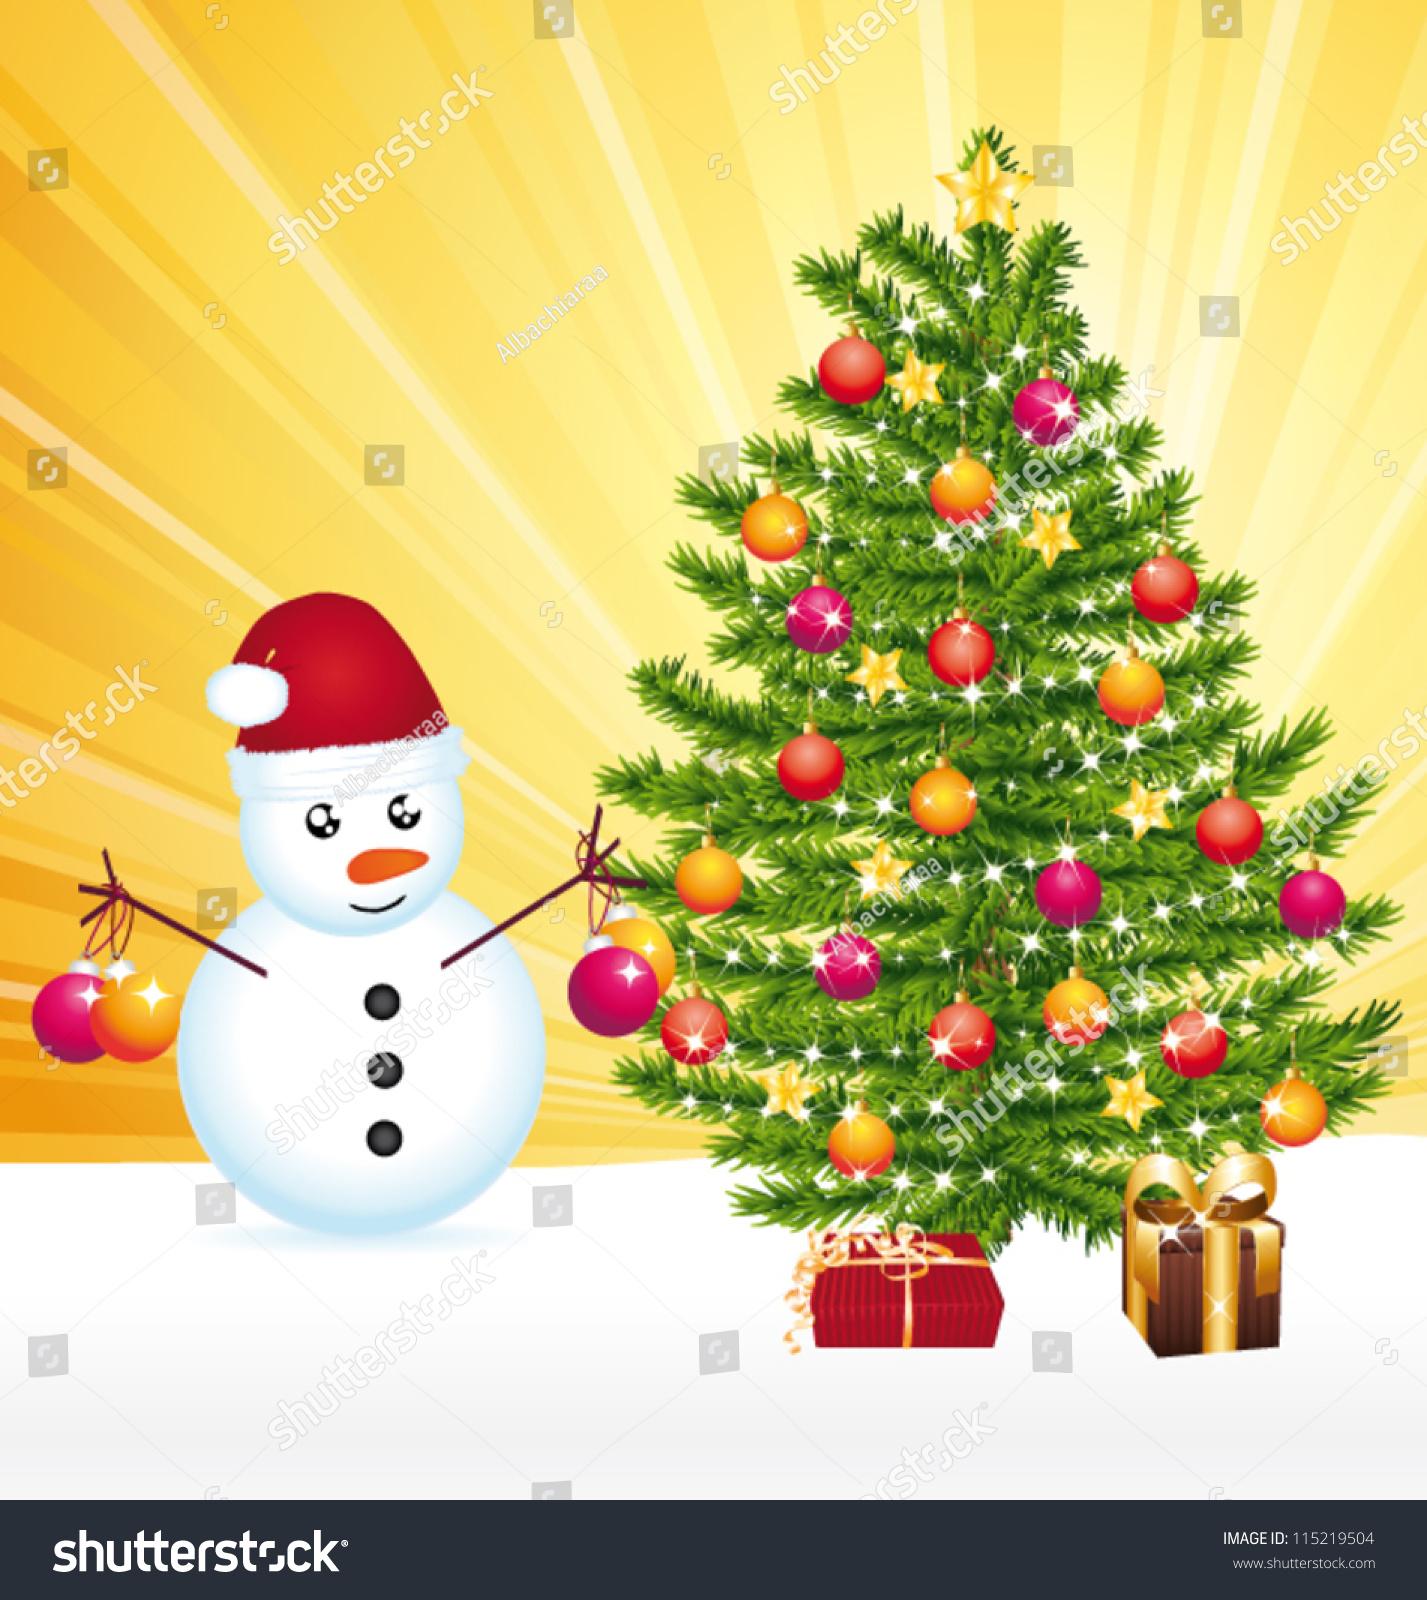 Snowman Decorating Joyful Christmas Tree Vector Stock Vector ...